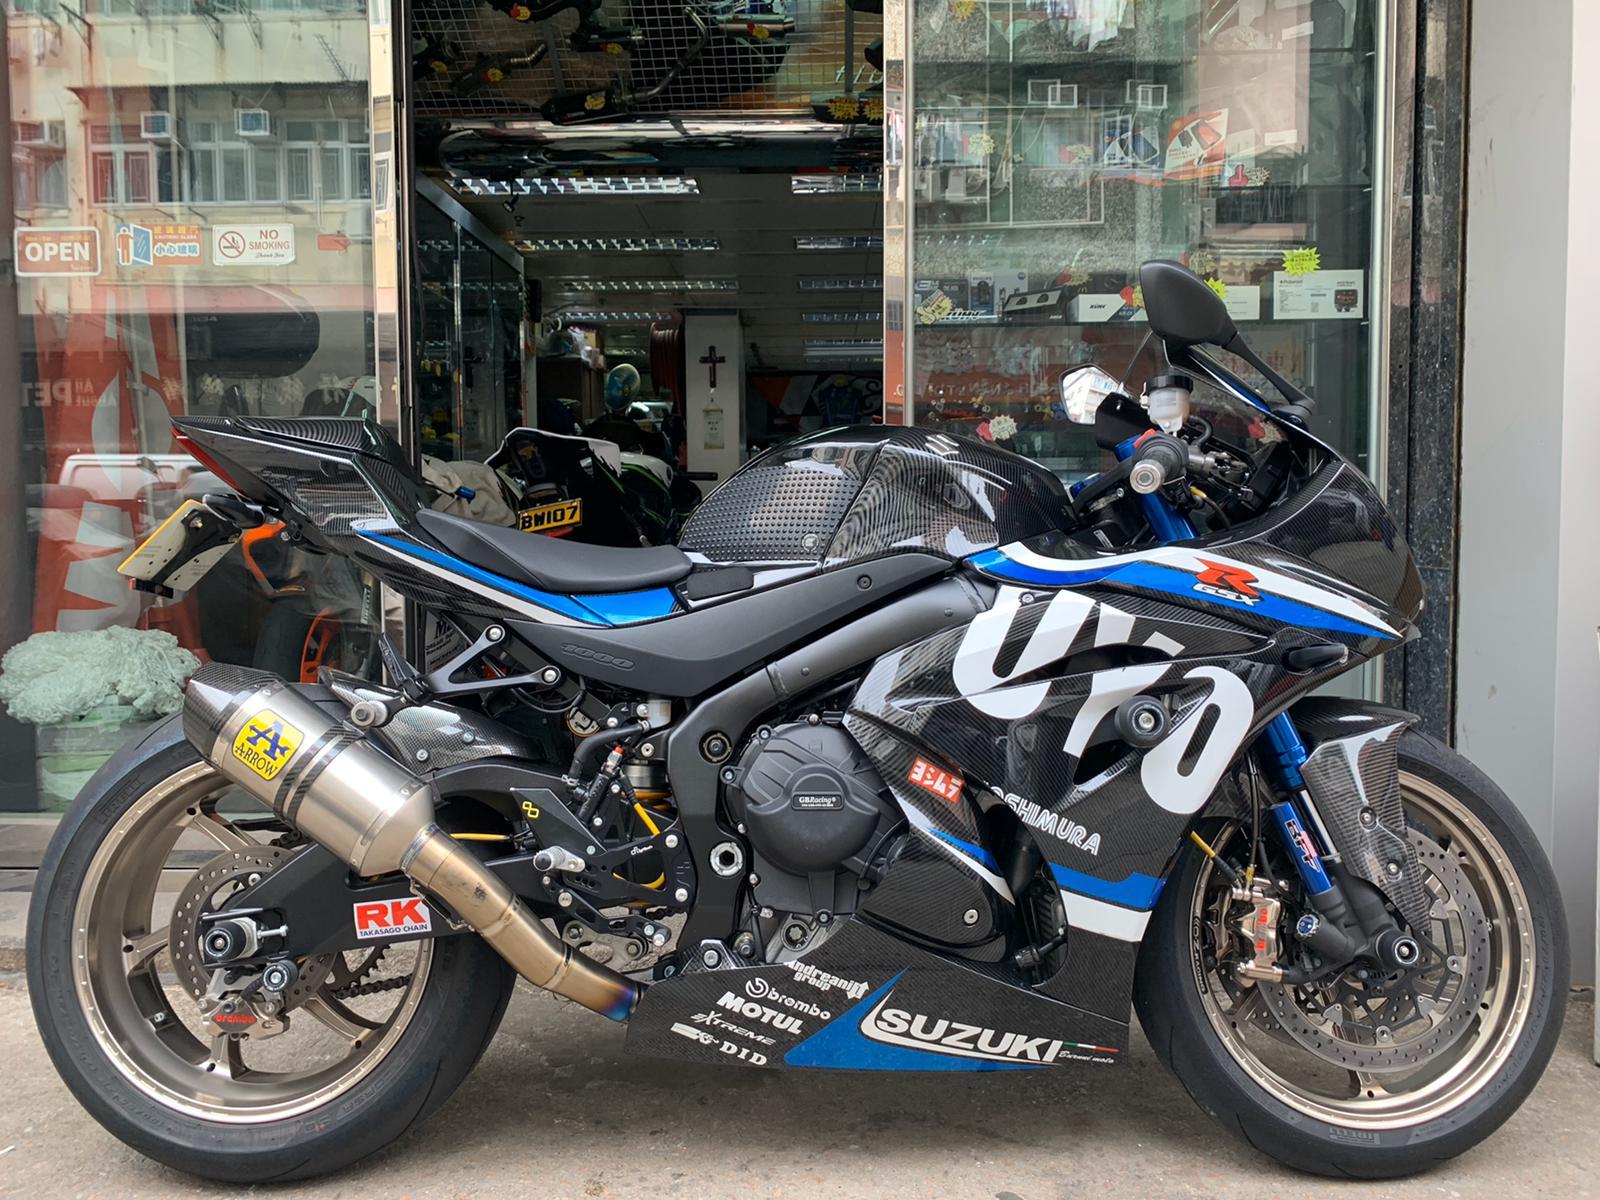 SUZUKI GSX-R1000 2018    -「Webike摩托車市」